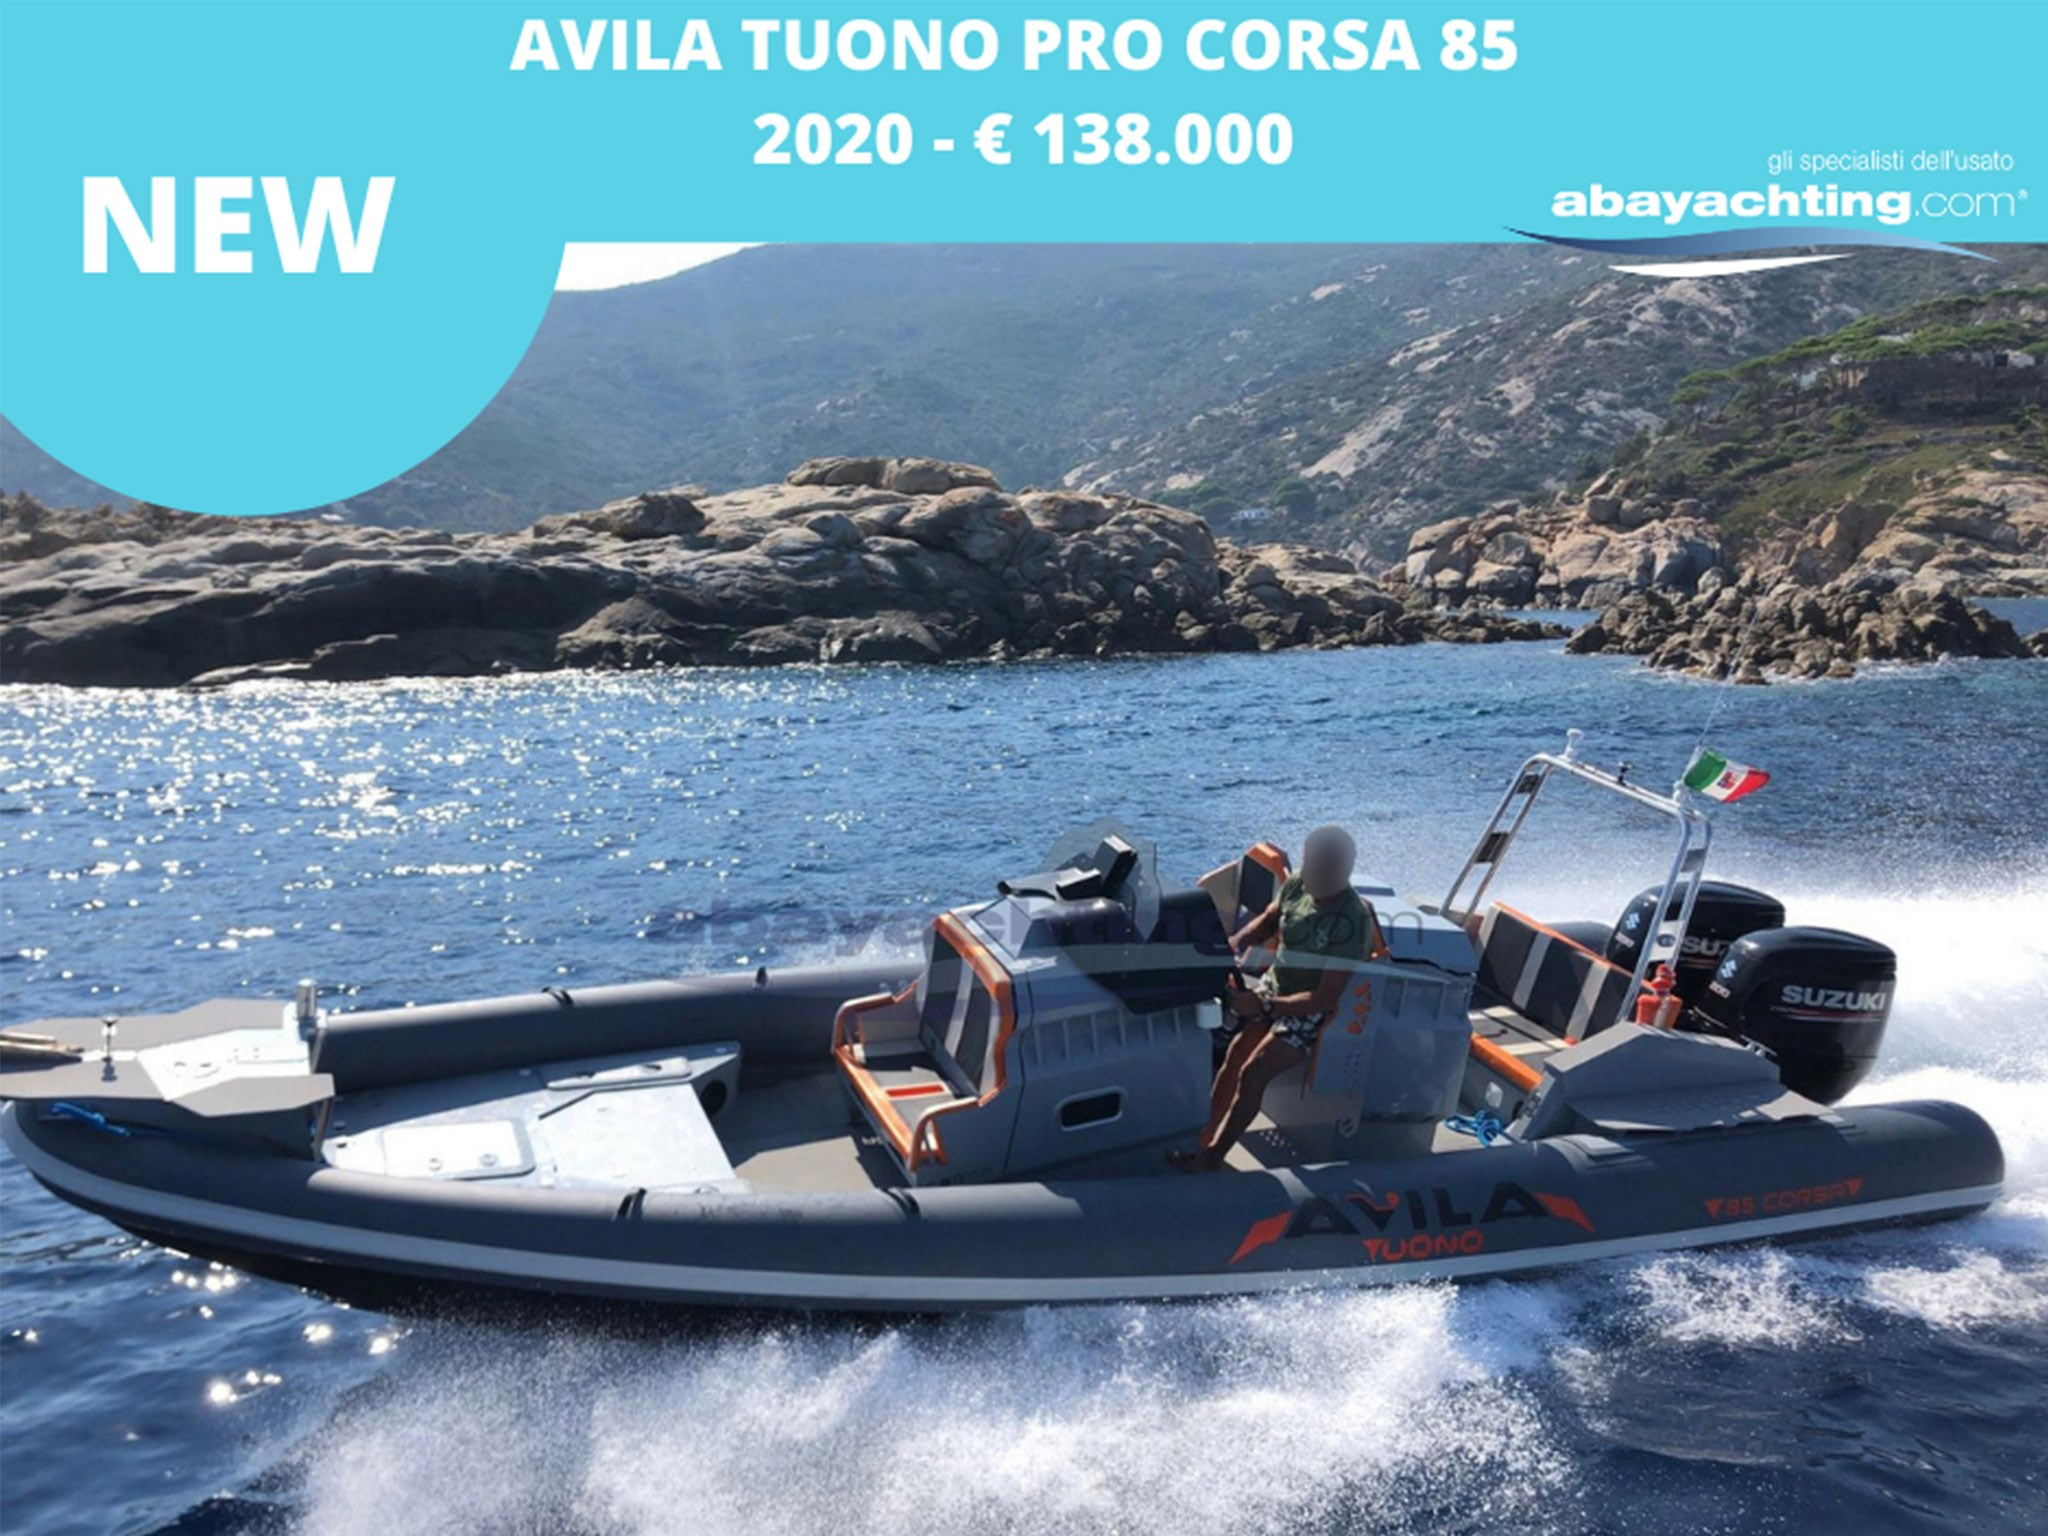 NEW ARRIVAL AVILA TUONO TYPE 8 PRO CORSA 85